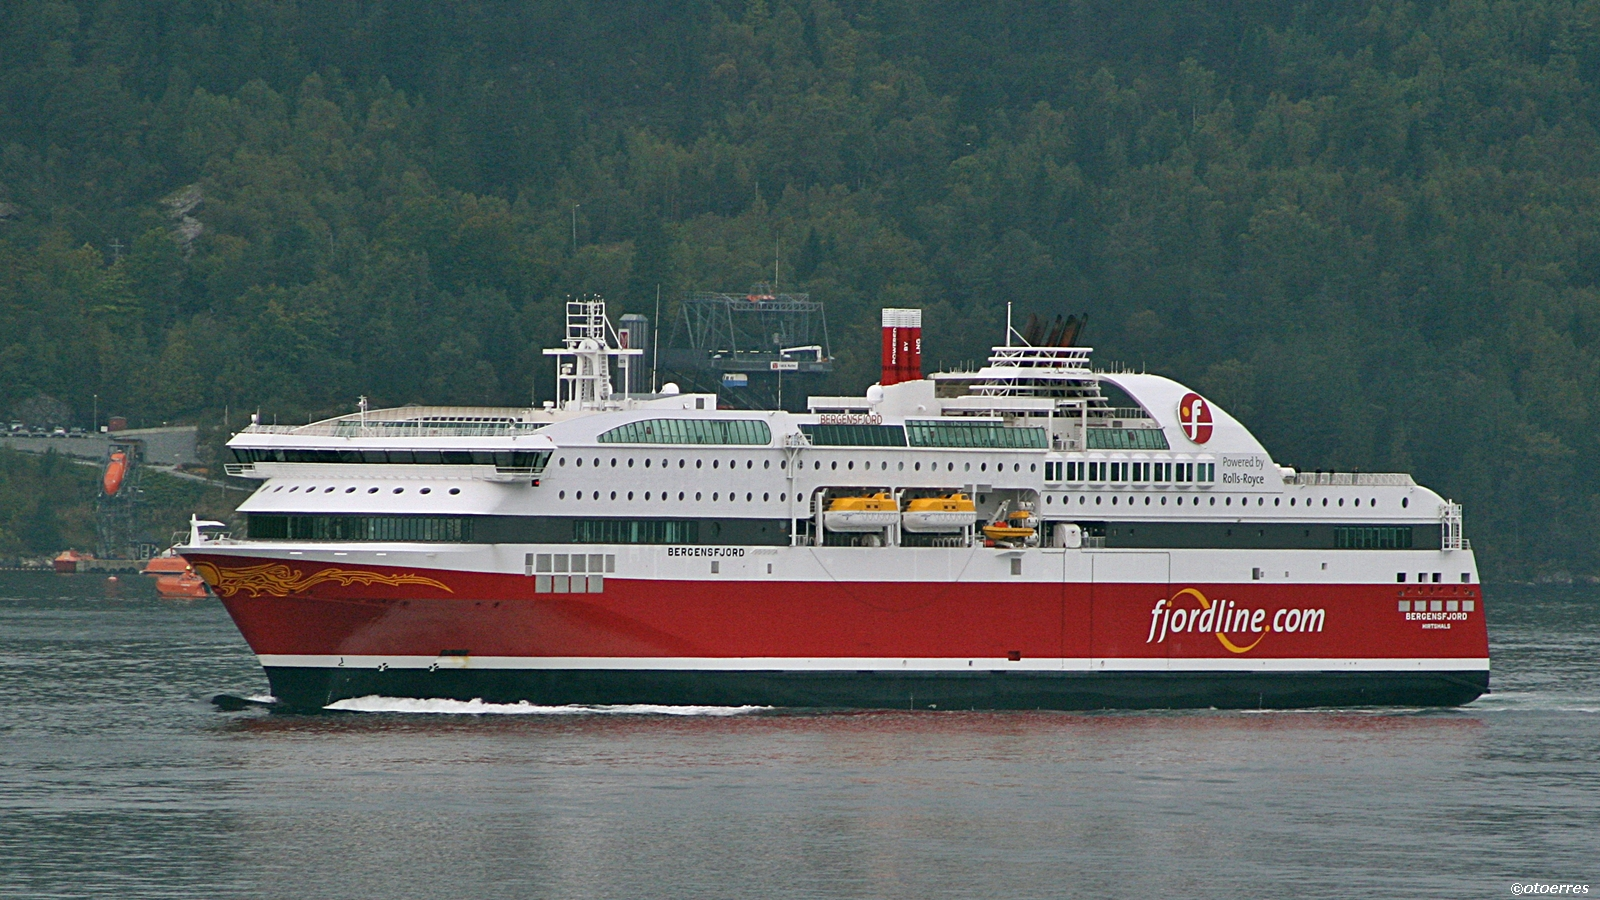 Ms Bergensfjord - Fjord Line - ©otoerres